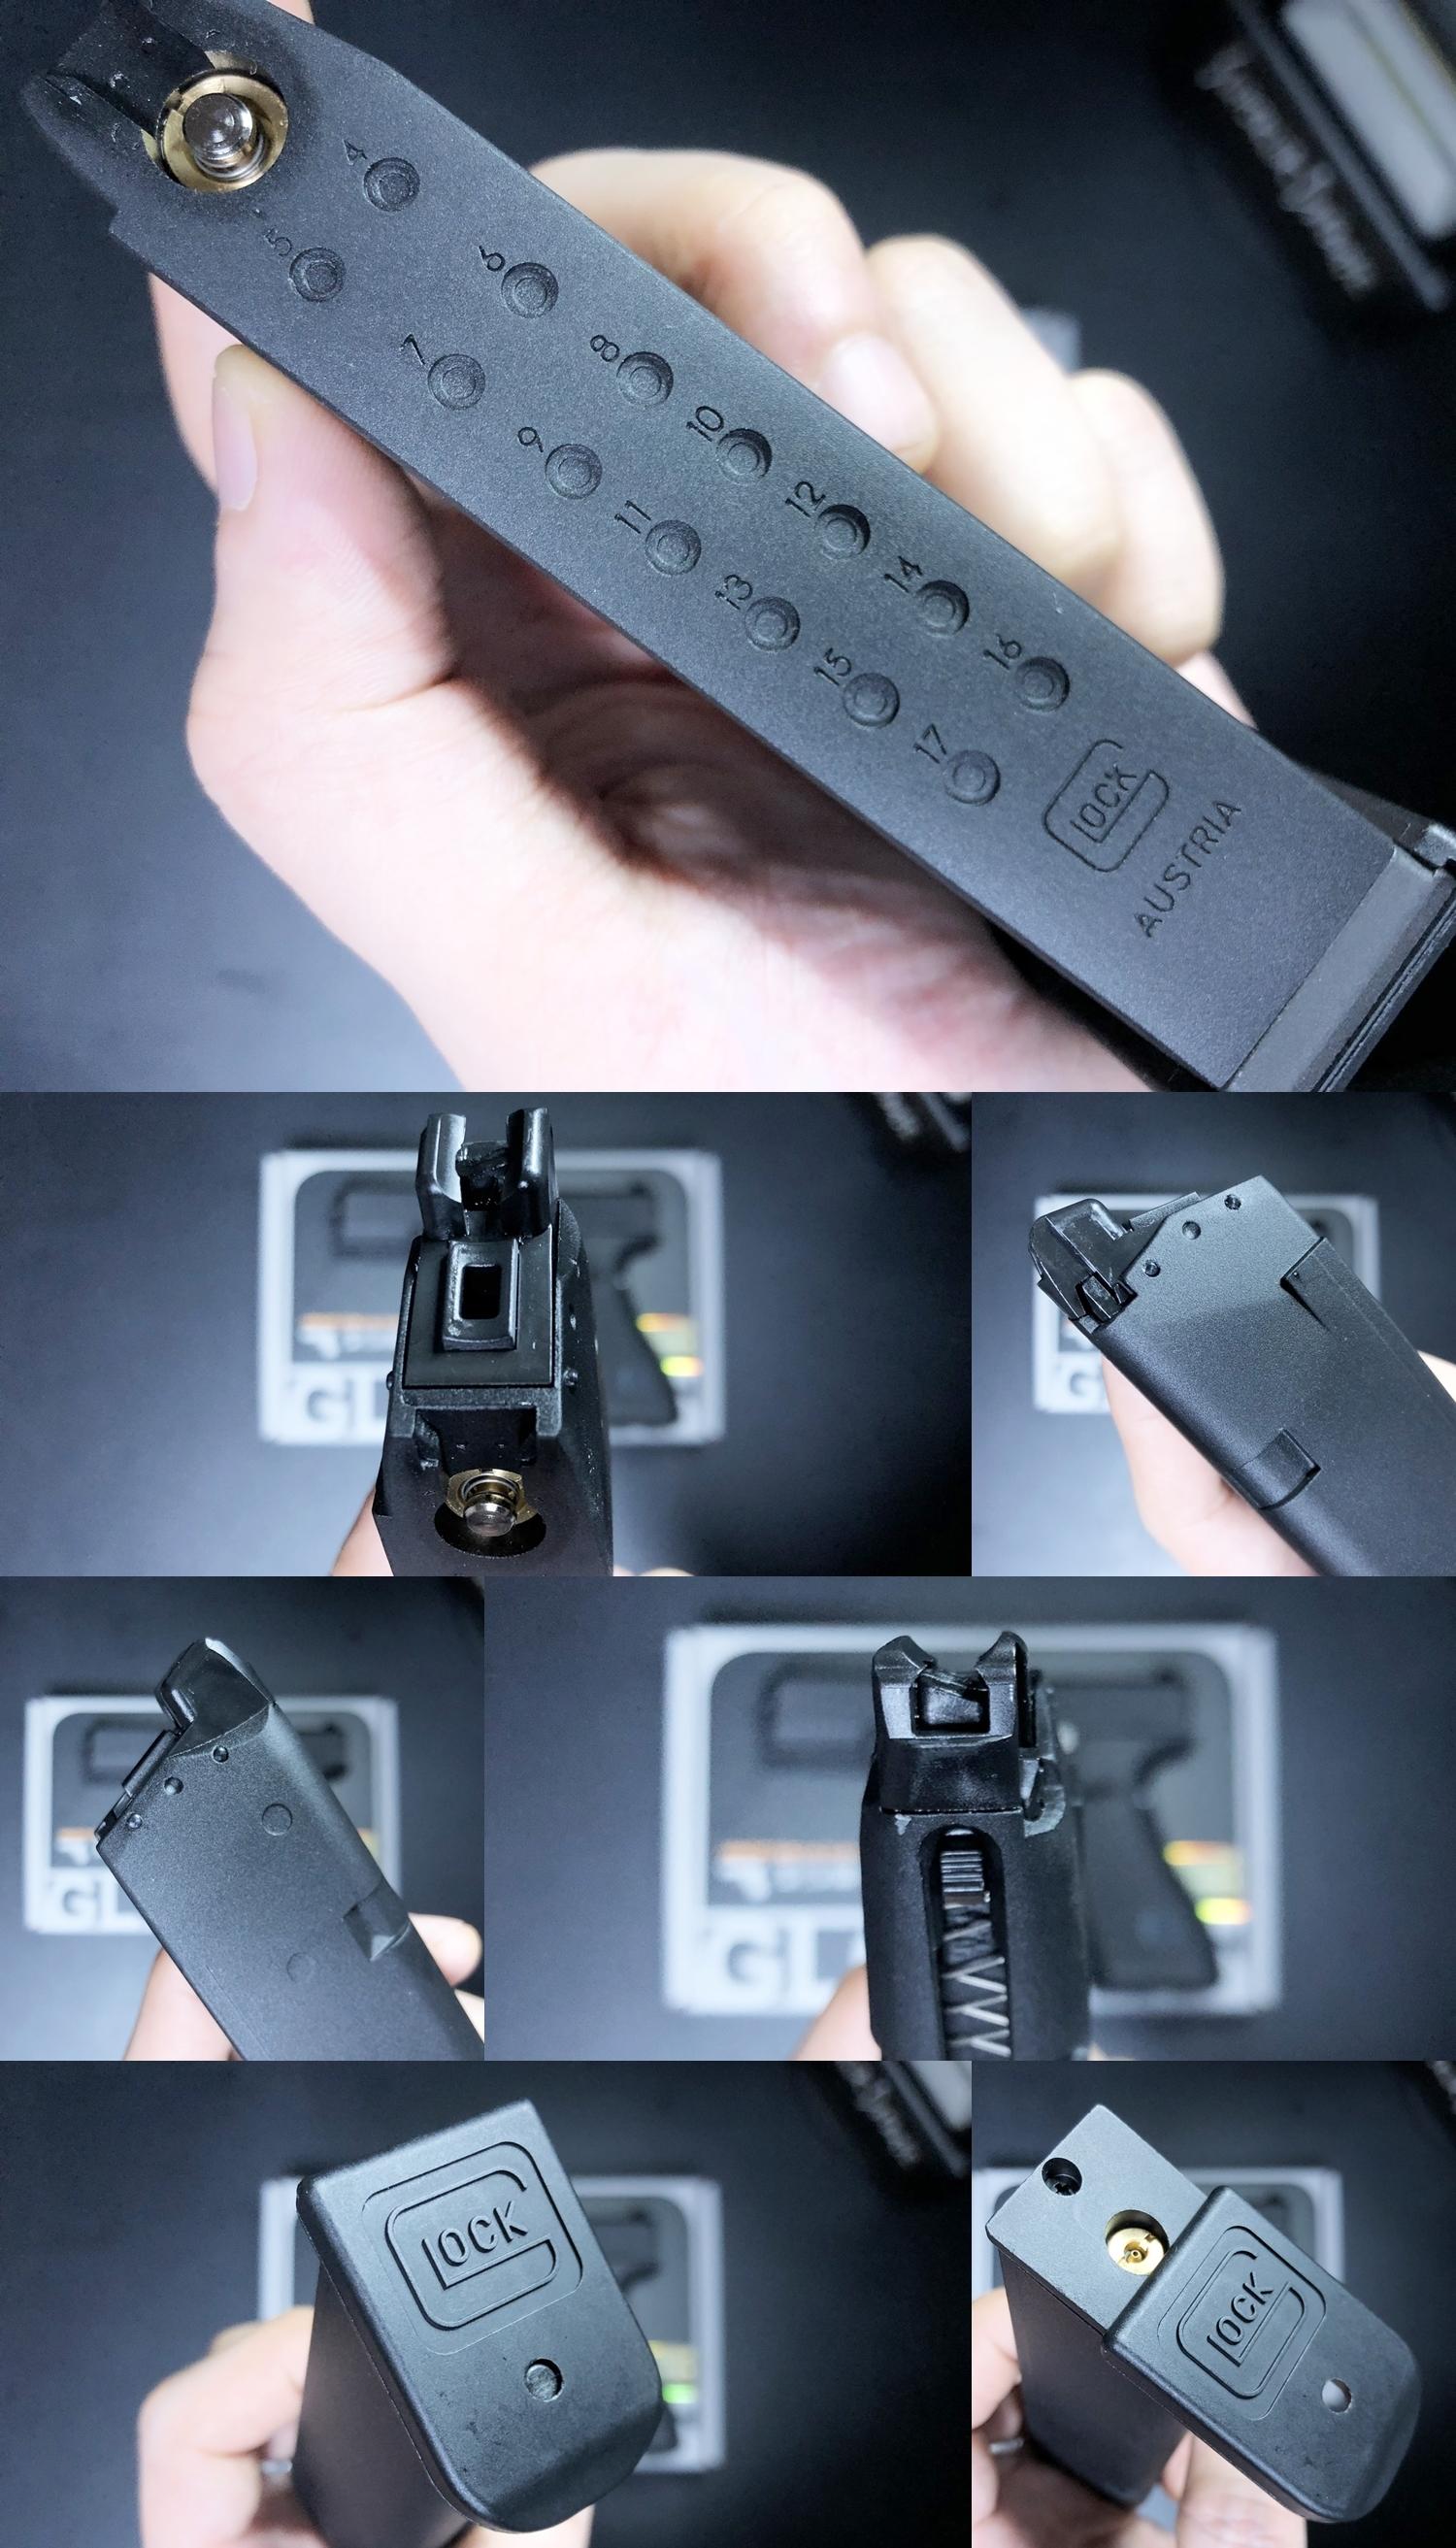 10 UMAREX VFC GLOCK G45 GBB AIRSOFT!! 噂のウマレックス G45 グロック ガスブローバック!! やっと我が家へ着弾 ~ 新品箱出し編!! 購入 開封 初速 計測 検証 比較 通常分解 組立 カスタム レビュー!!